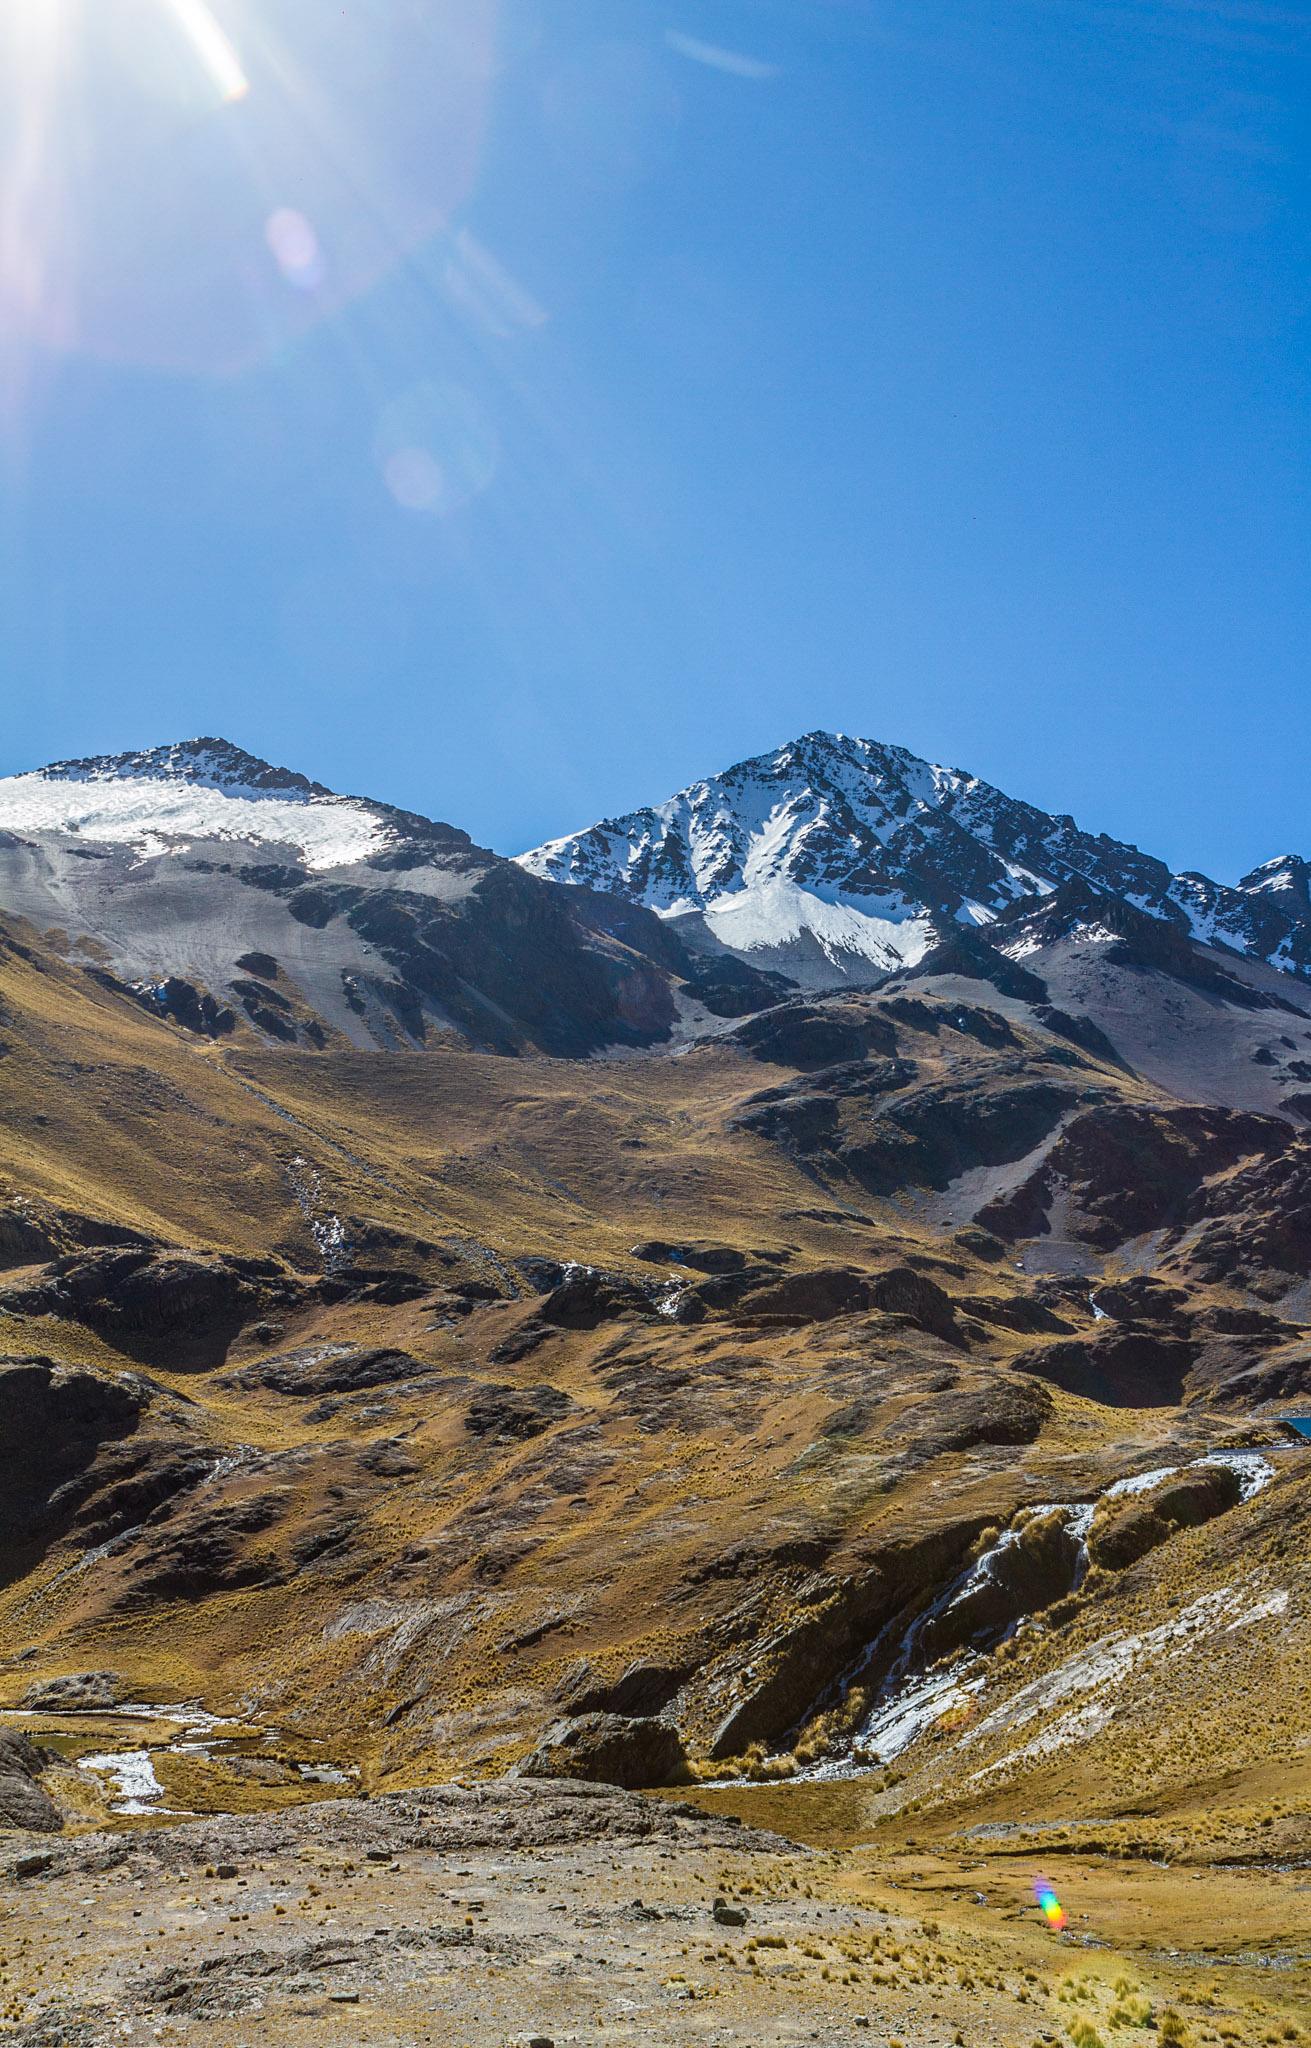 Ali-Barqawi-Studios-Explore-Series-Travel-Adventure-Documentary-C4CGAZA-Bolivia-Mount-Tarija-2015-114.jpg